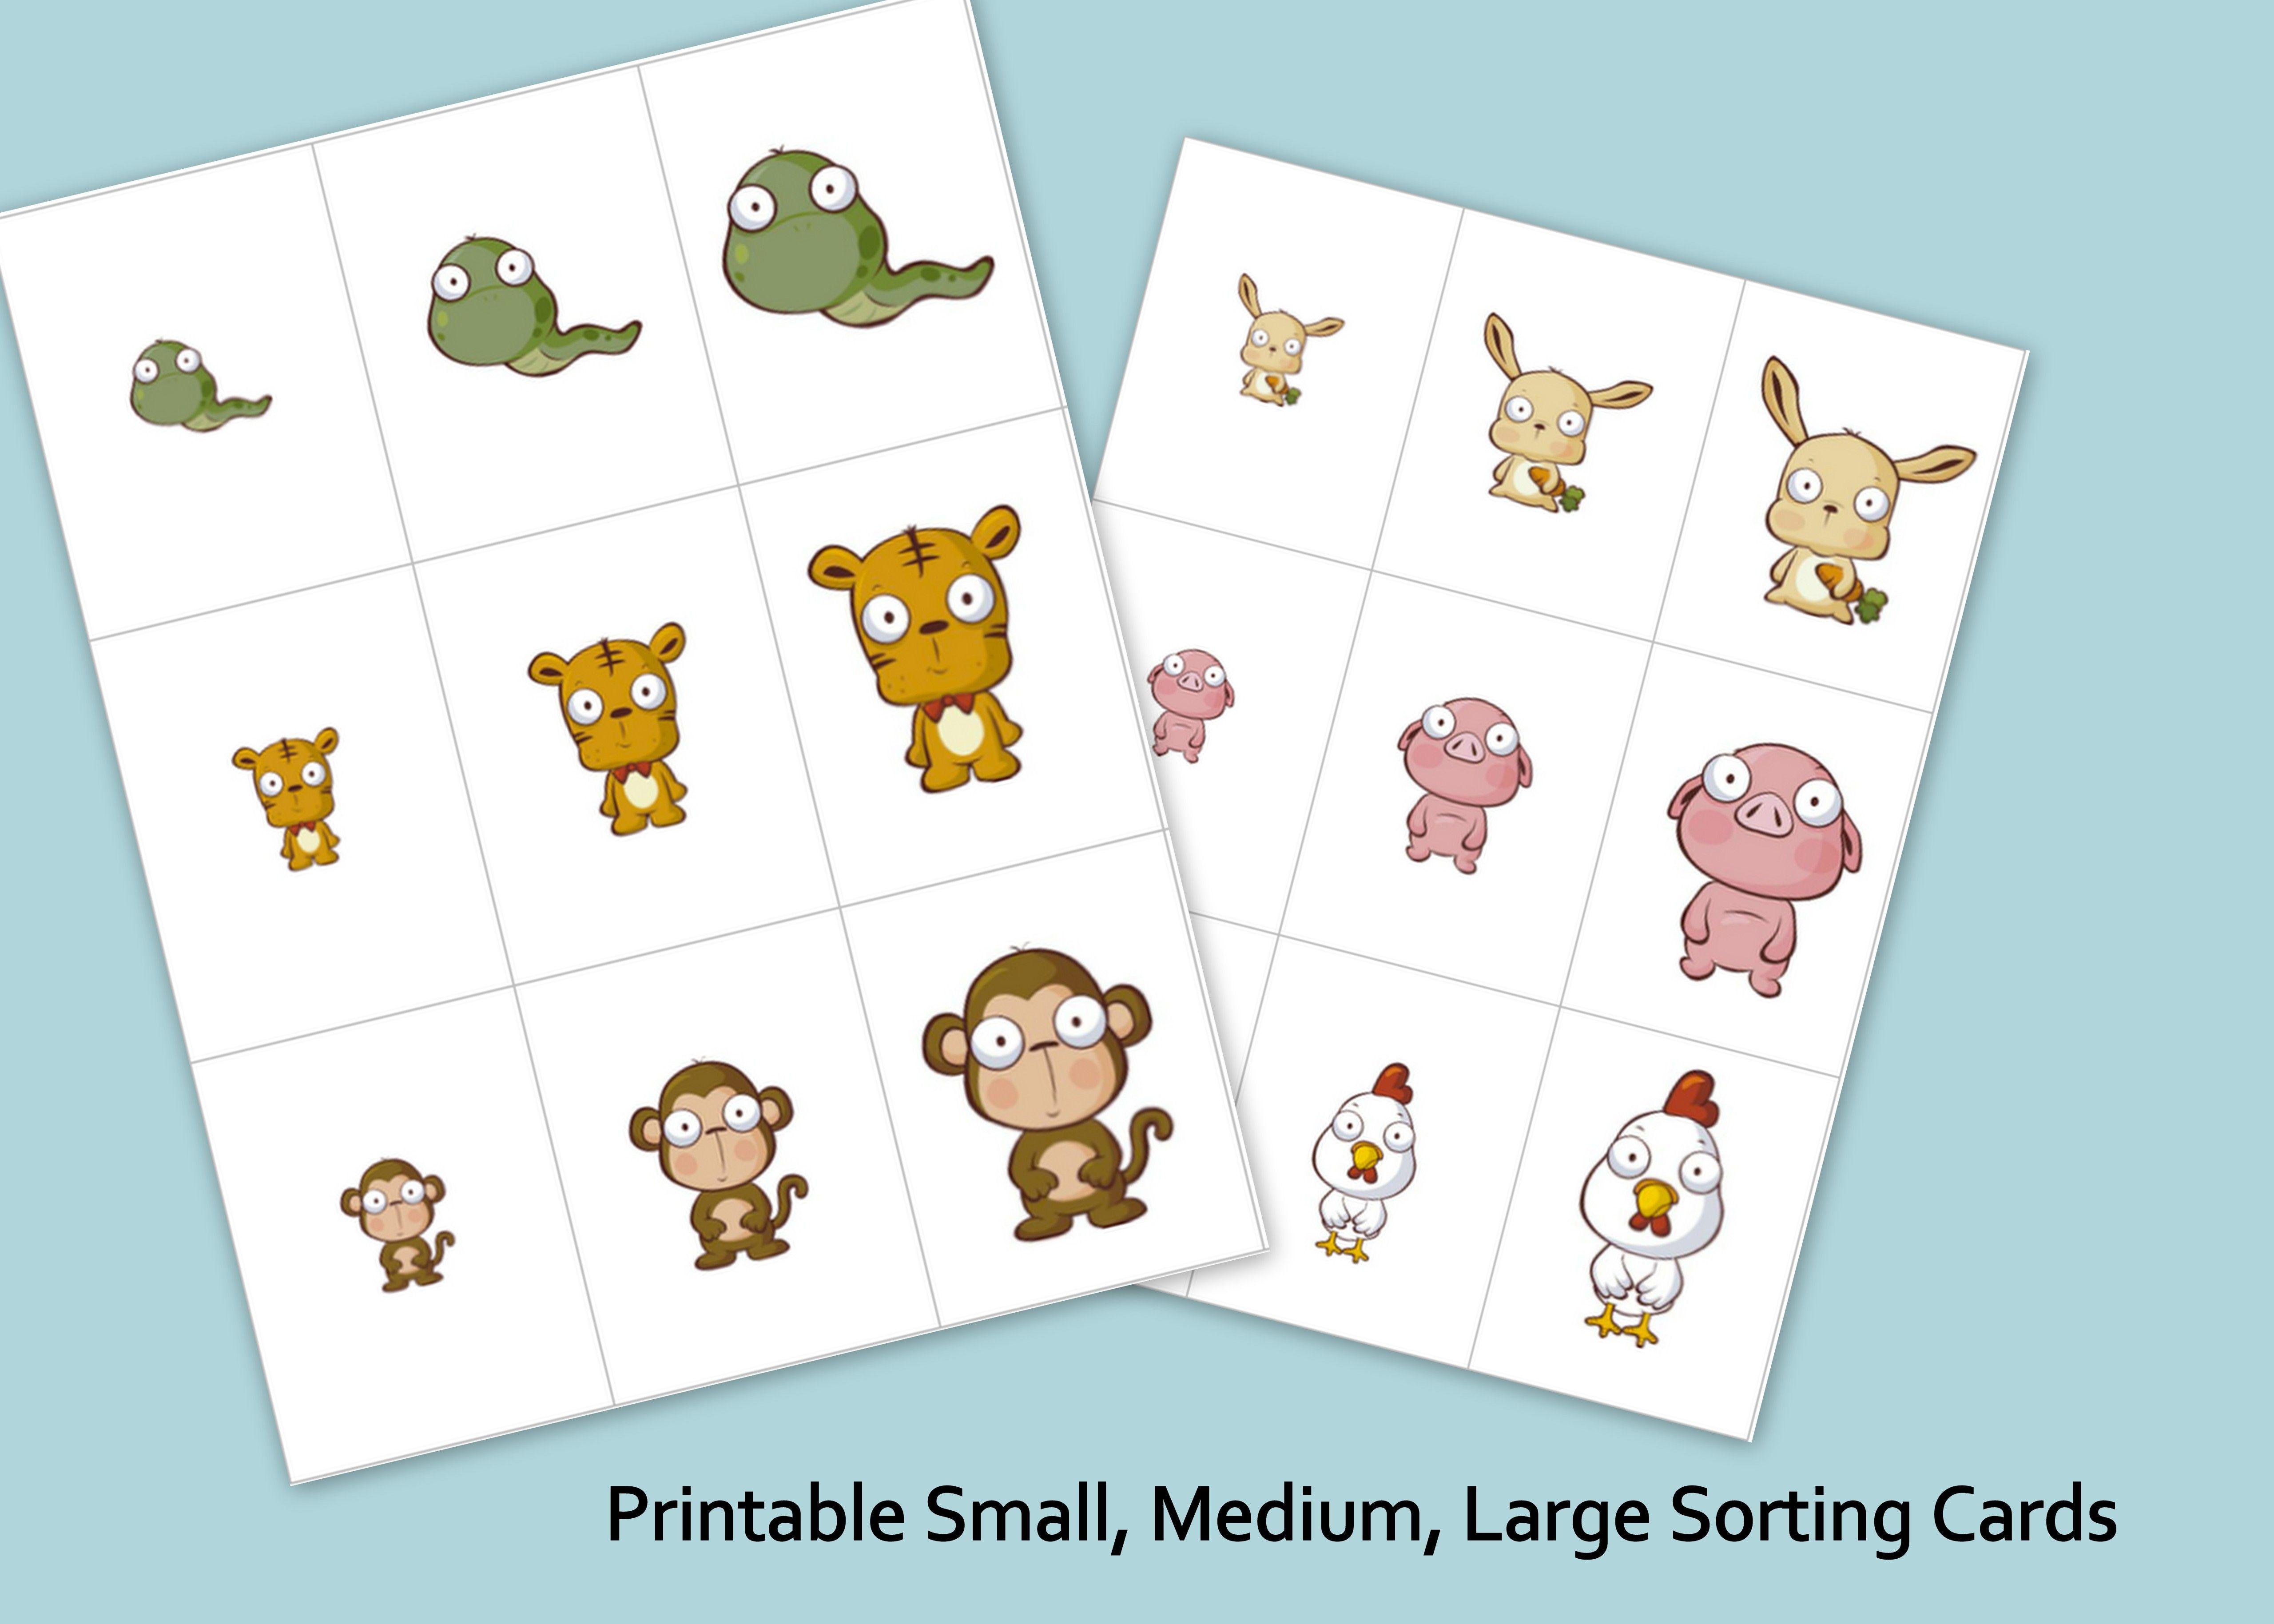 Printable Small Medium Large Animals Sorting Cards Shapes Preschool Preschool Activities [ 3657 x 5120 Pixel ]